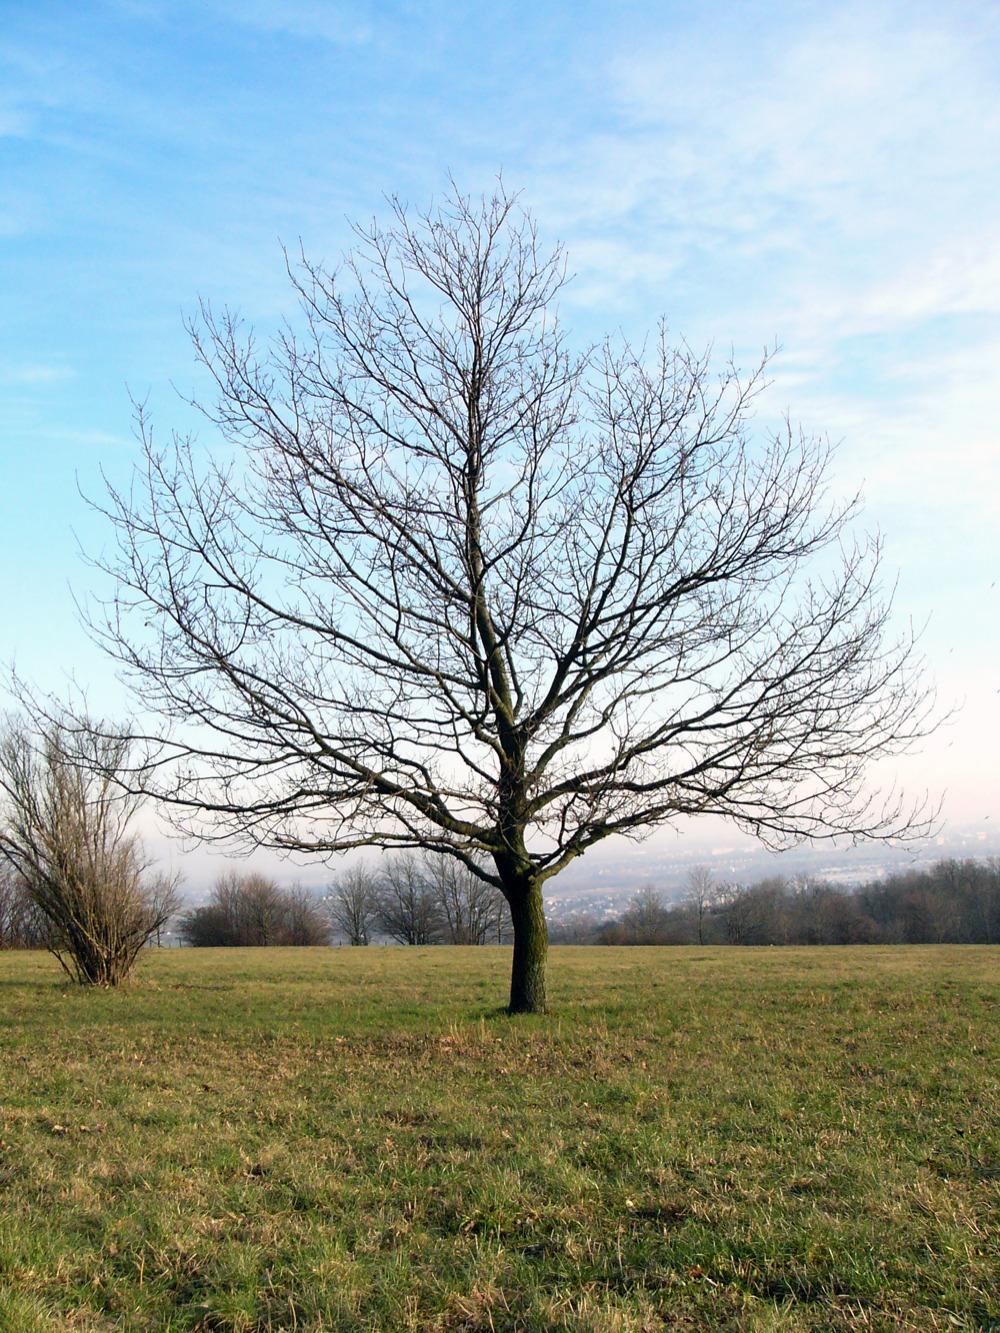 http://uncoy.com/images/winter-tree-P1040554-1.jpg